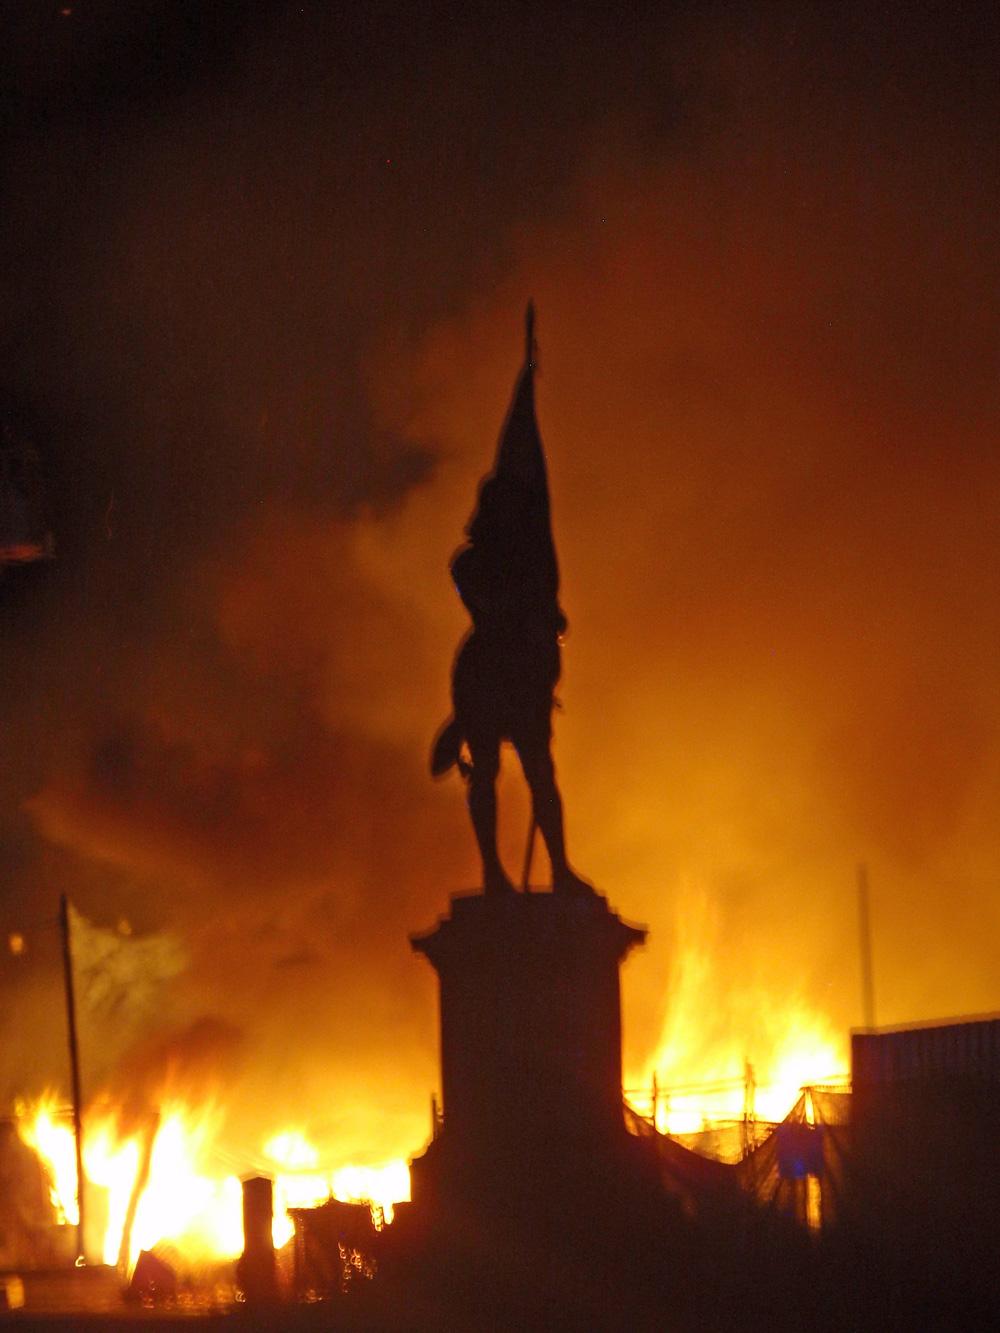 0317 Noumea fire 3 Fire2